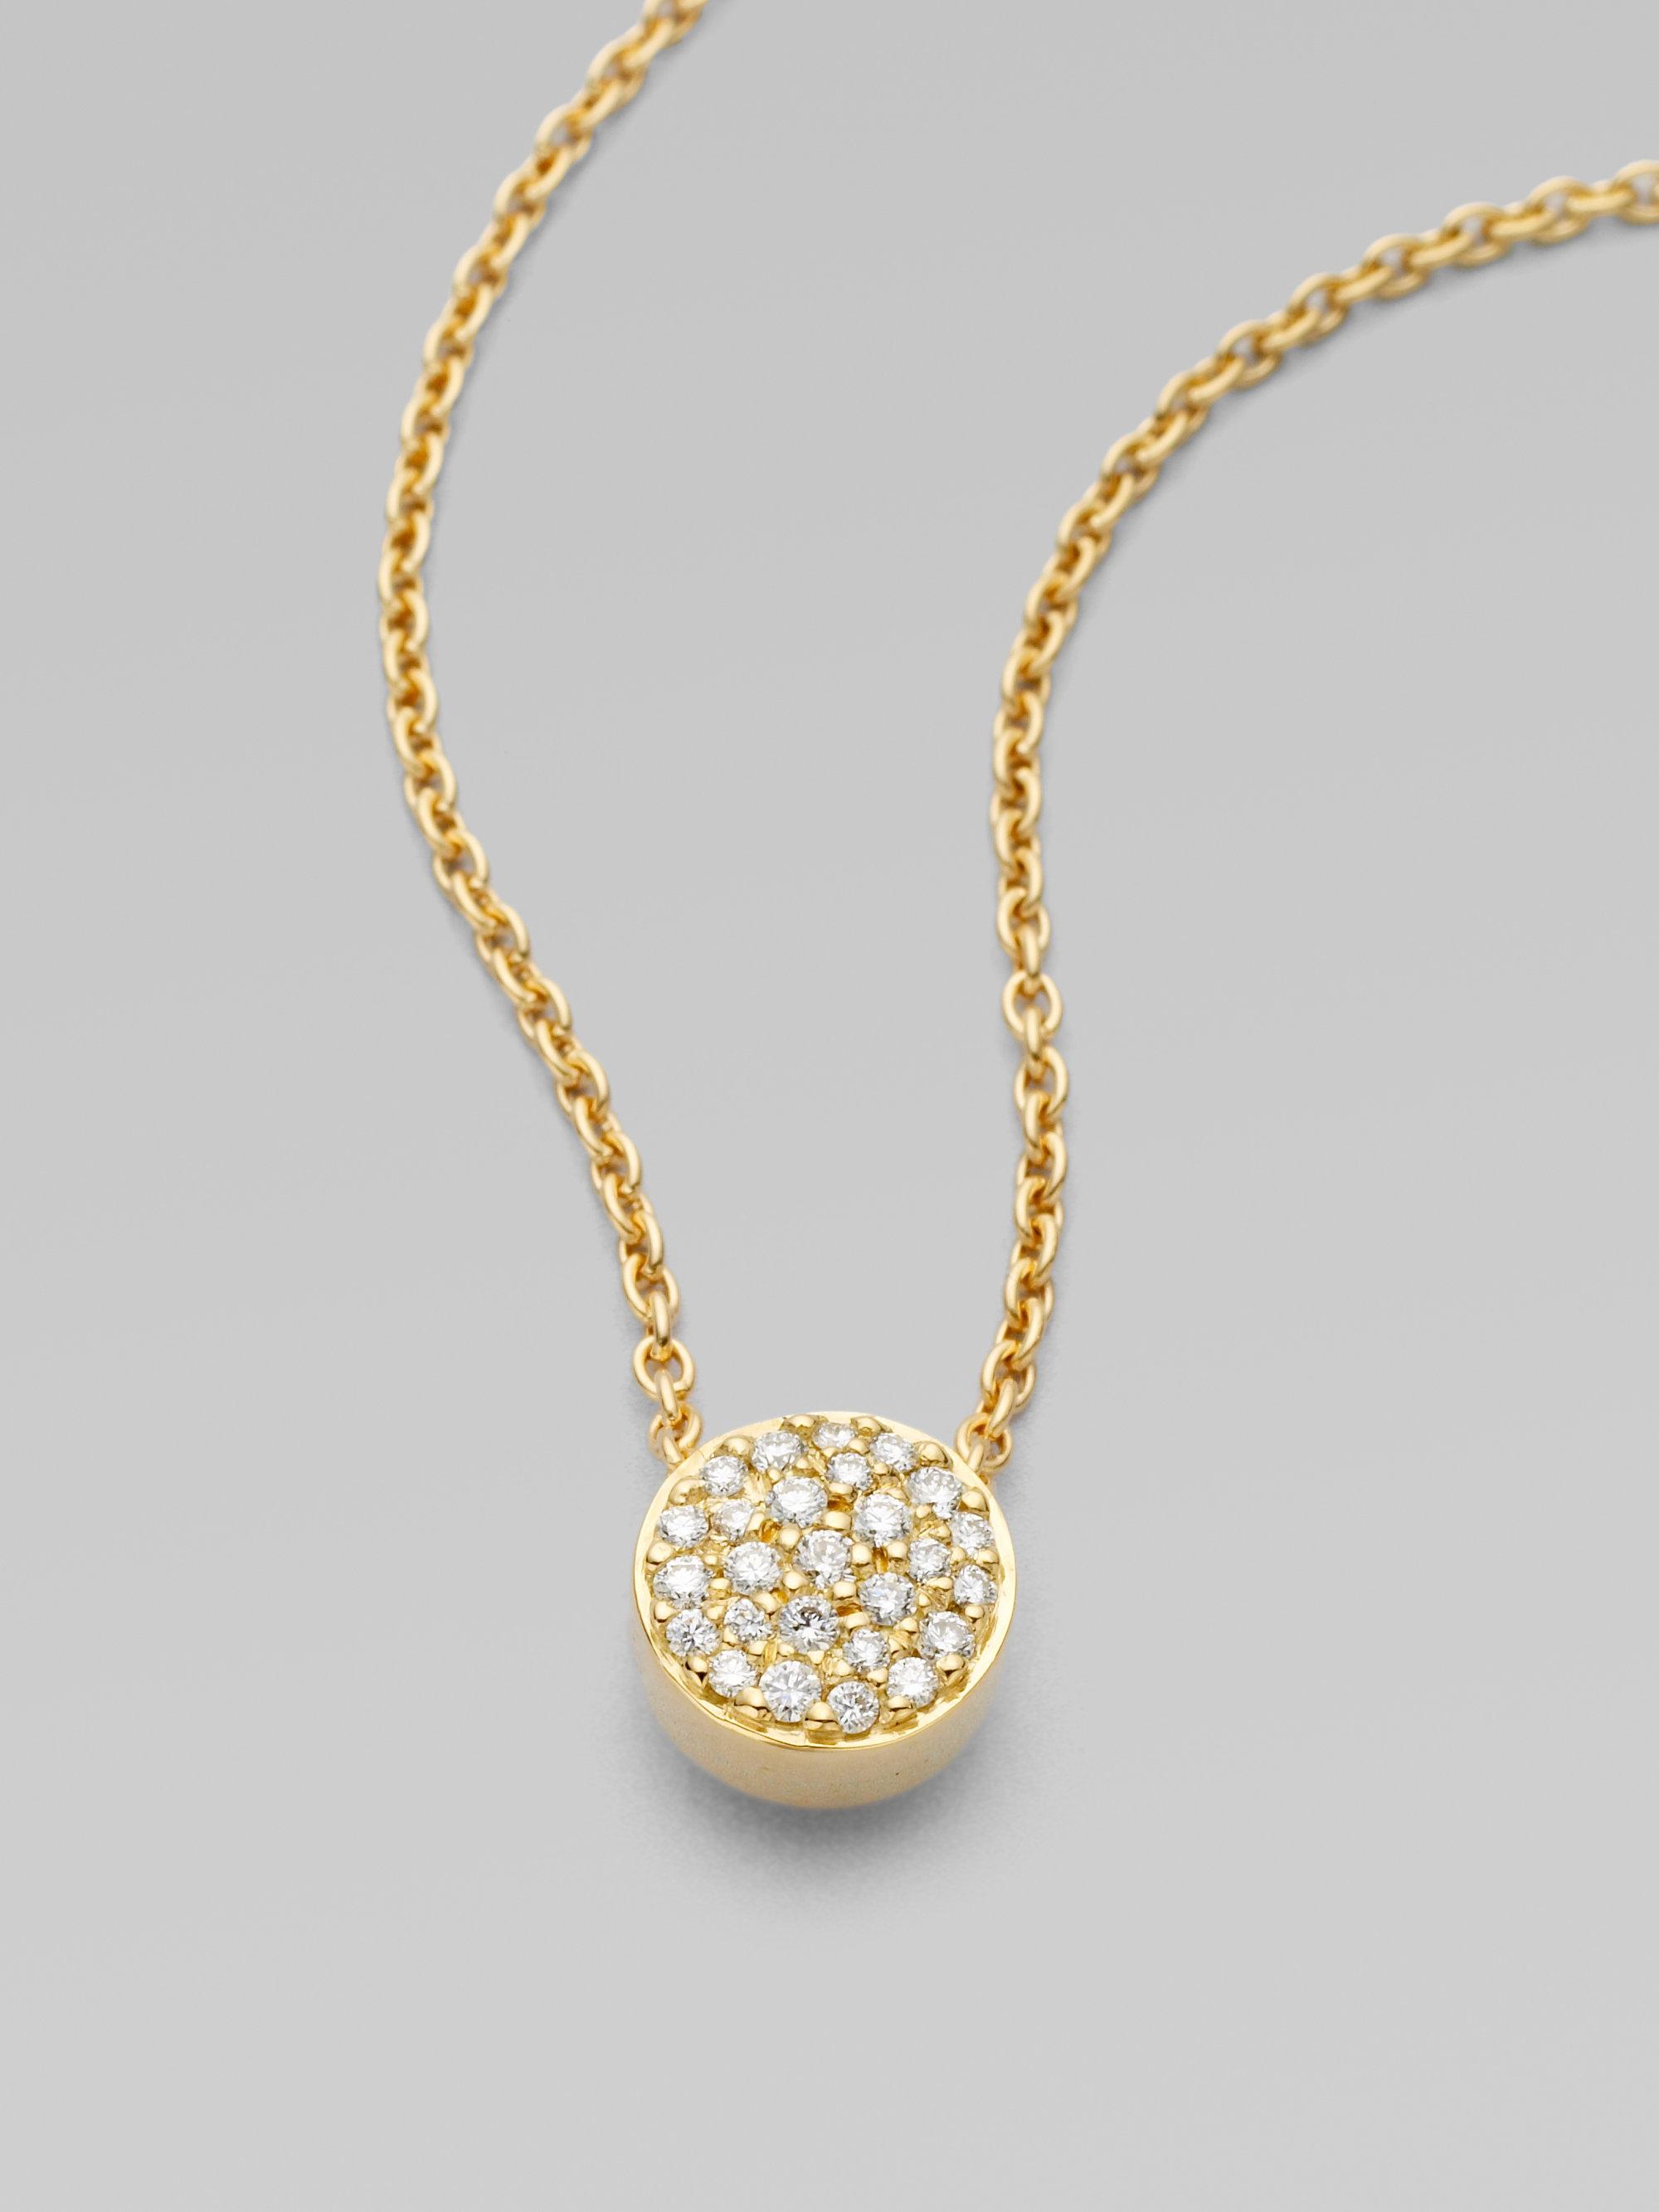 Lyst georg jensen 18k yellow gold pav diamond pendant necklace in gallery aloadofball Images